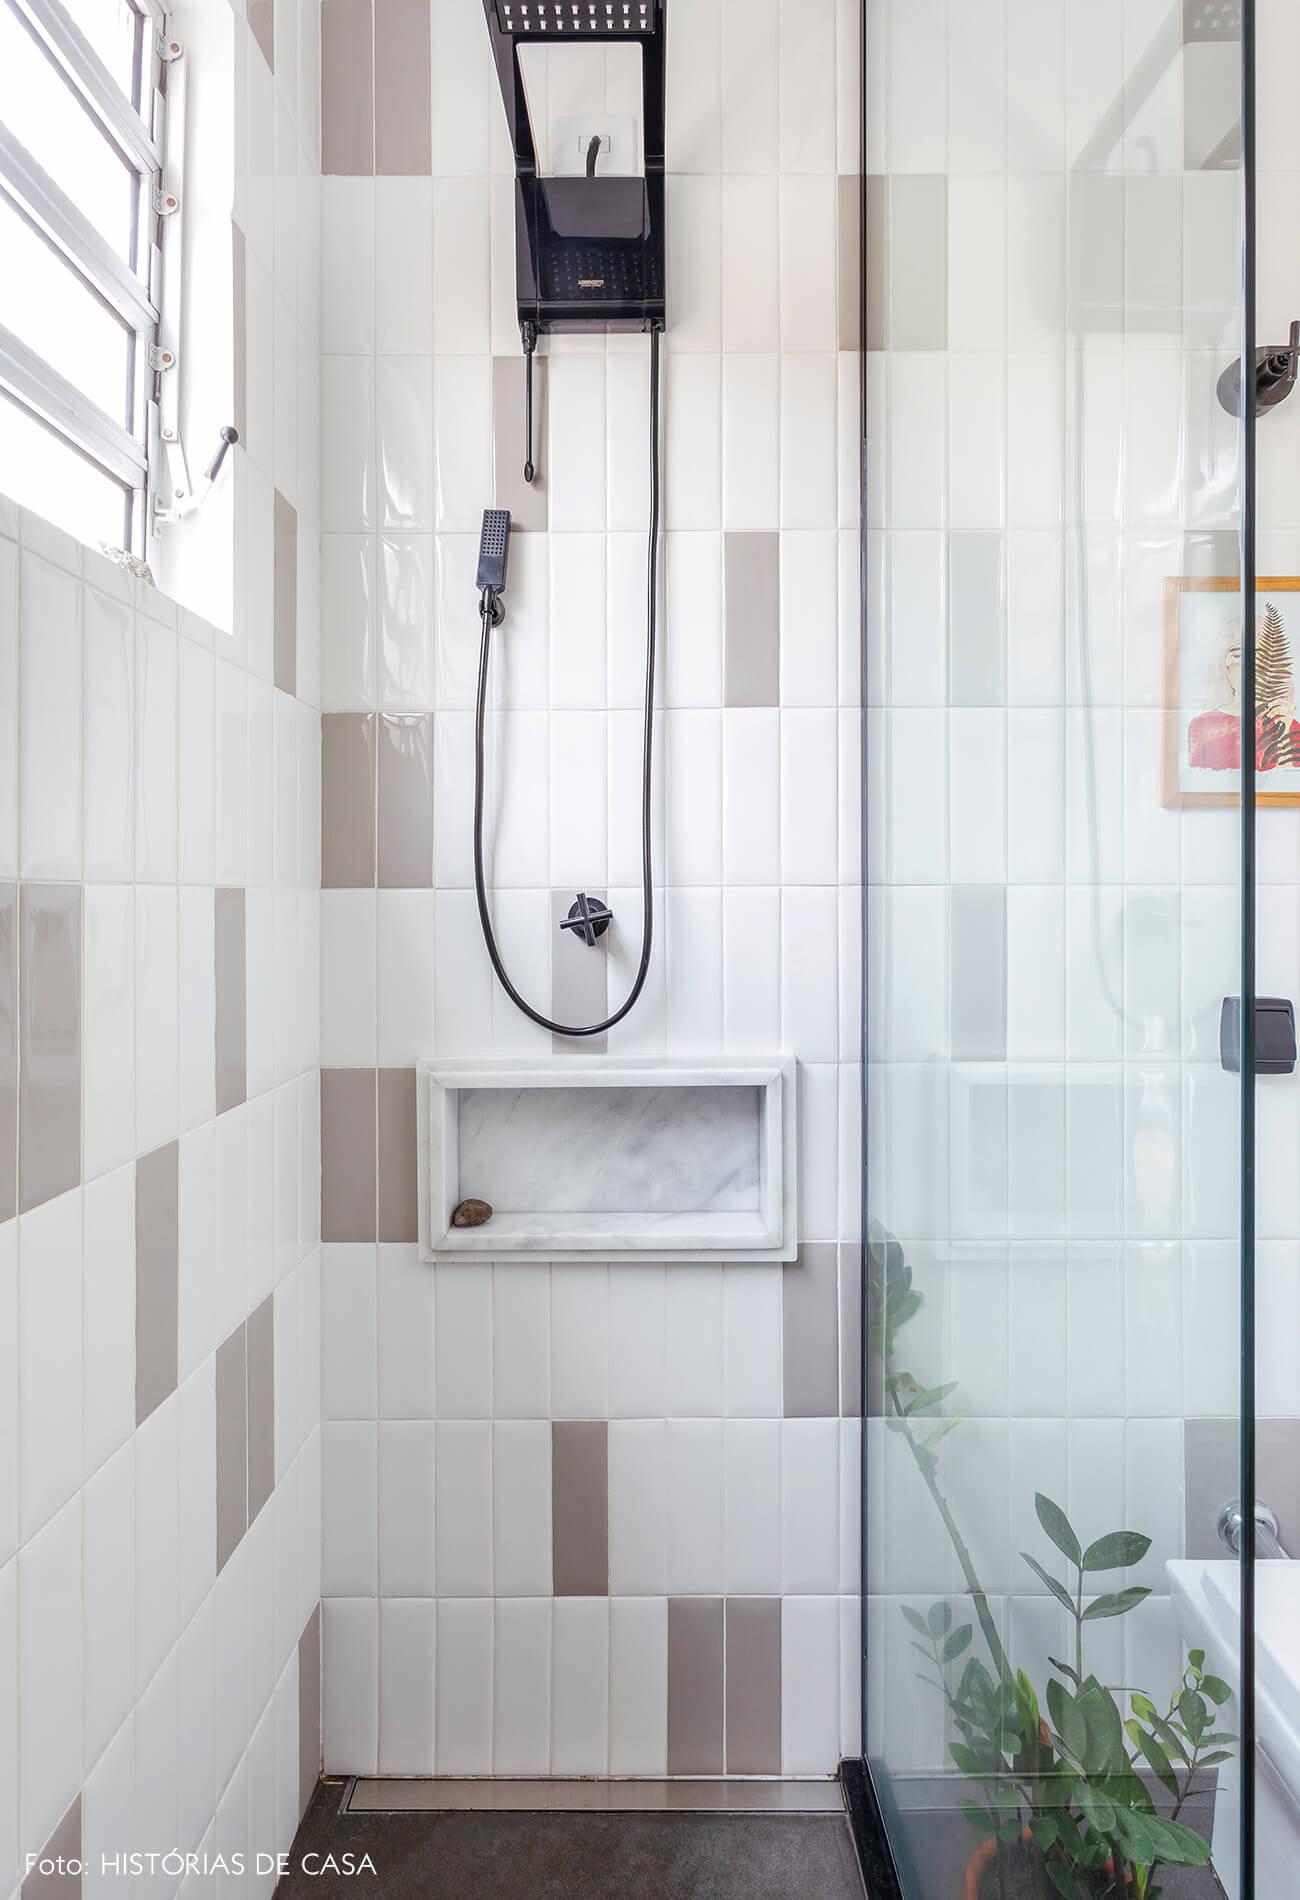 Antes e depois reforma de banheiro, novos revestimentos, subway tile cinza e branco aplicado na vertical